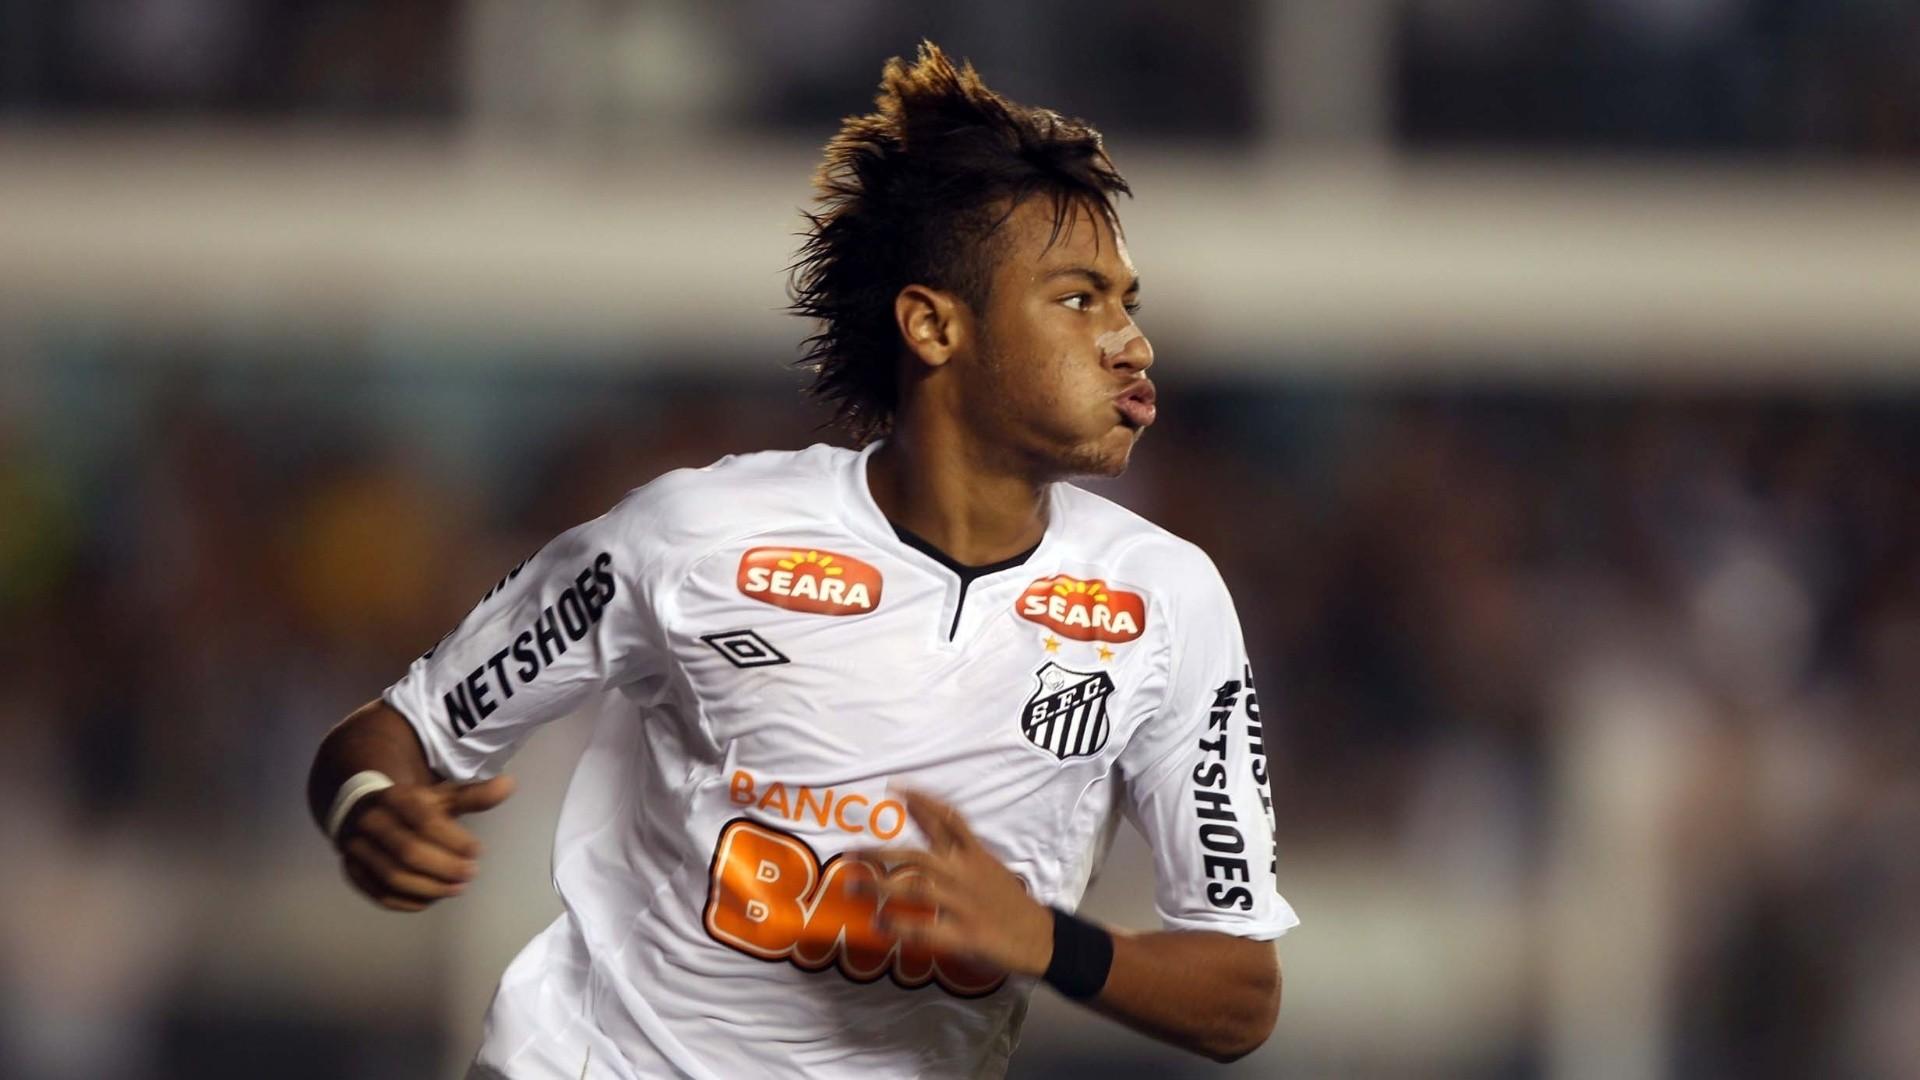 Neymar in Santos FC, 2009-2013